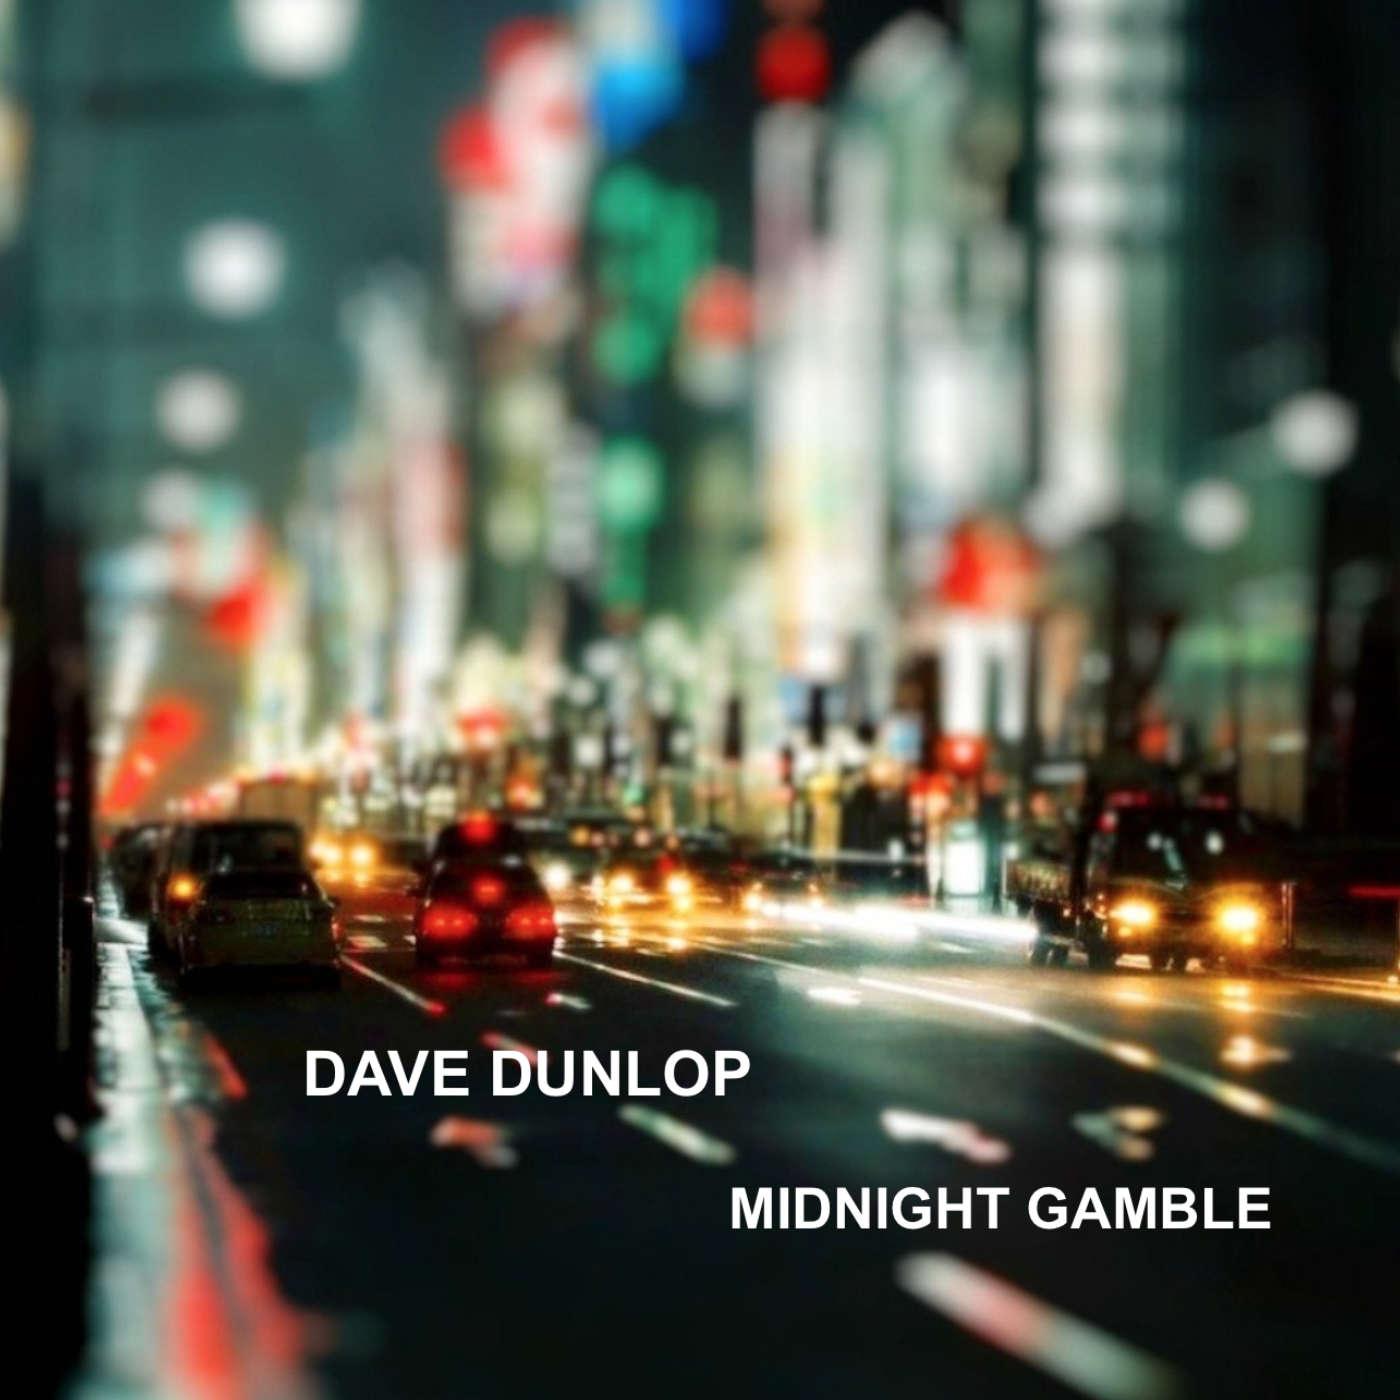 Dave Dunlop-Midnight Gamble